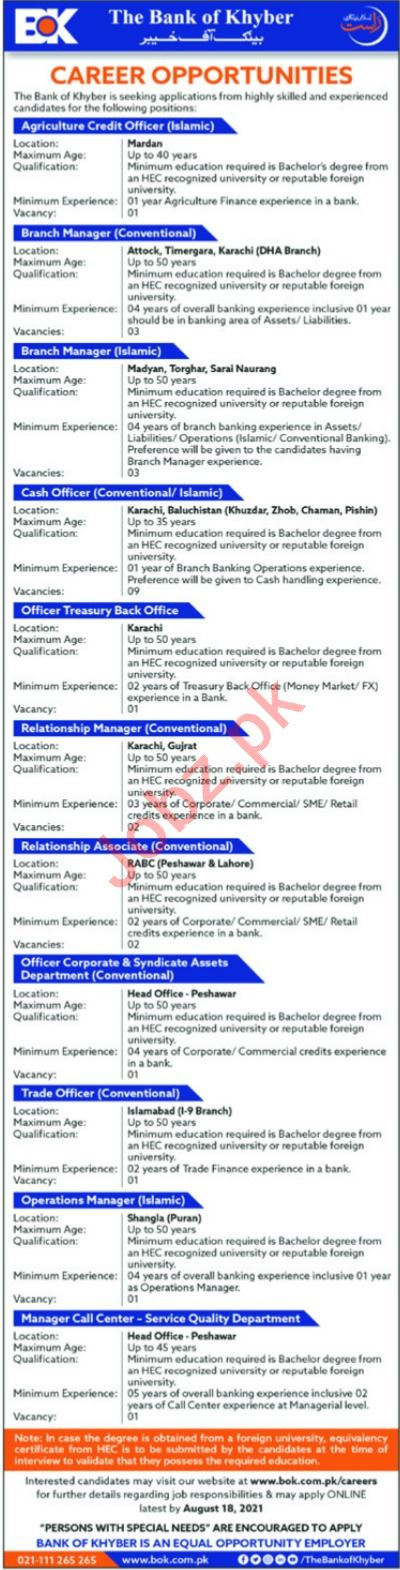 Bank of Khyber BOK Jobs 2021 Cash Officer & Branch Manager